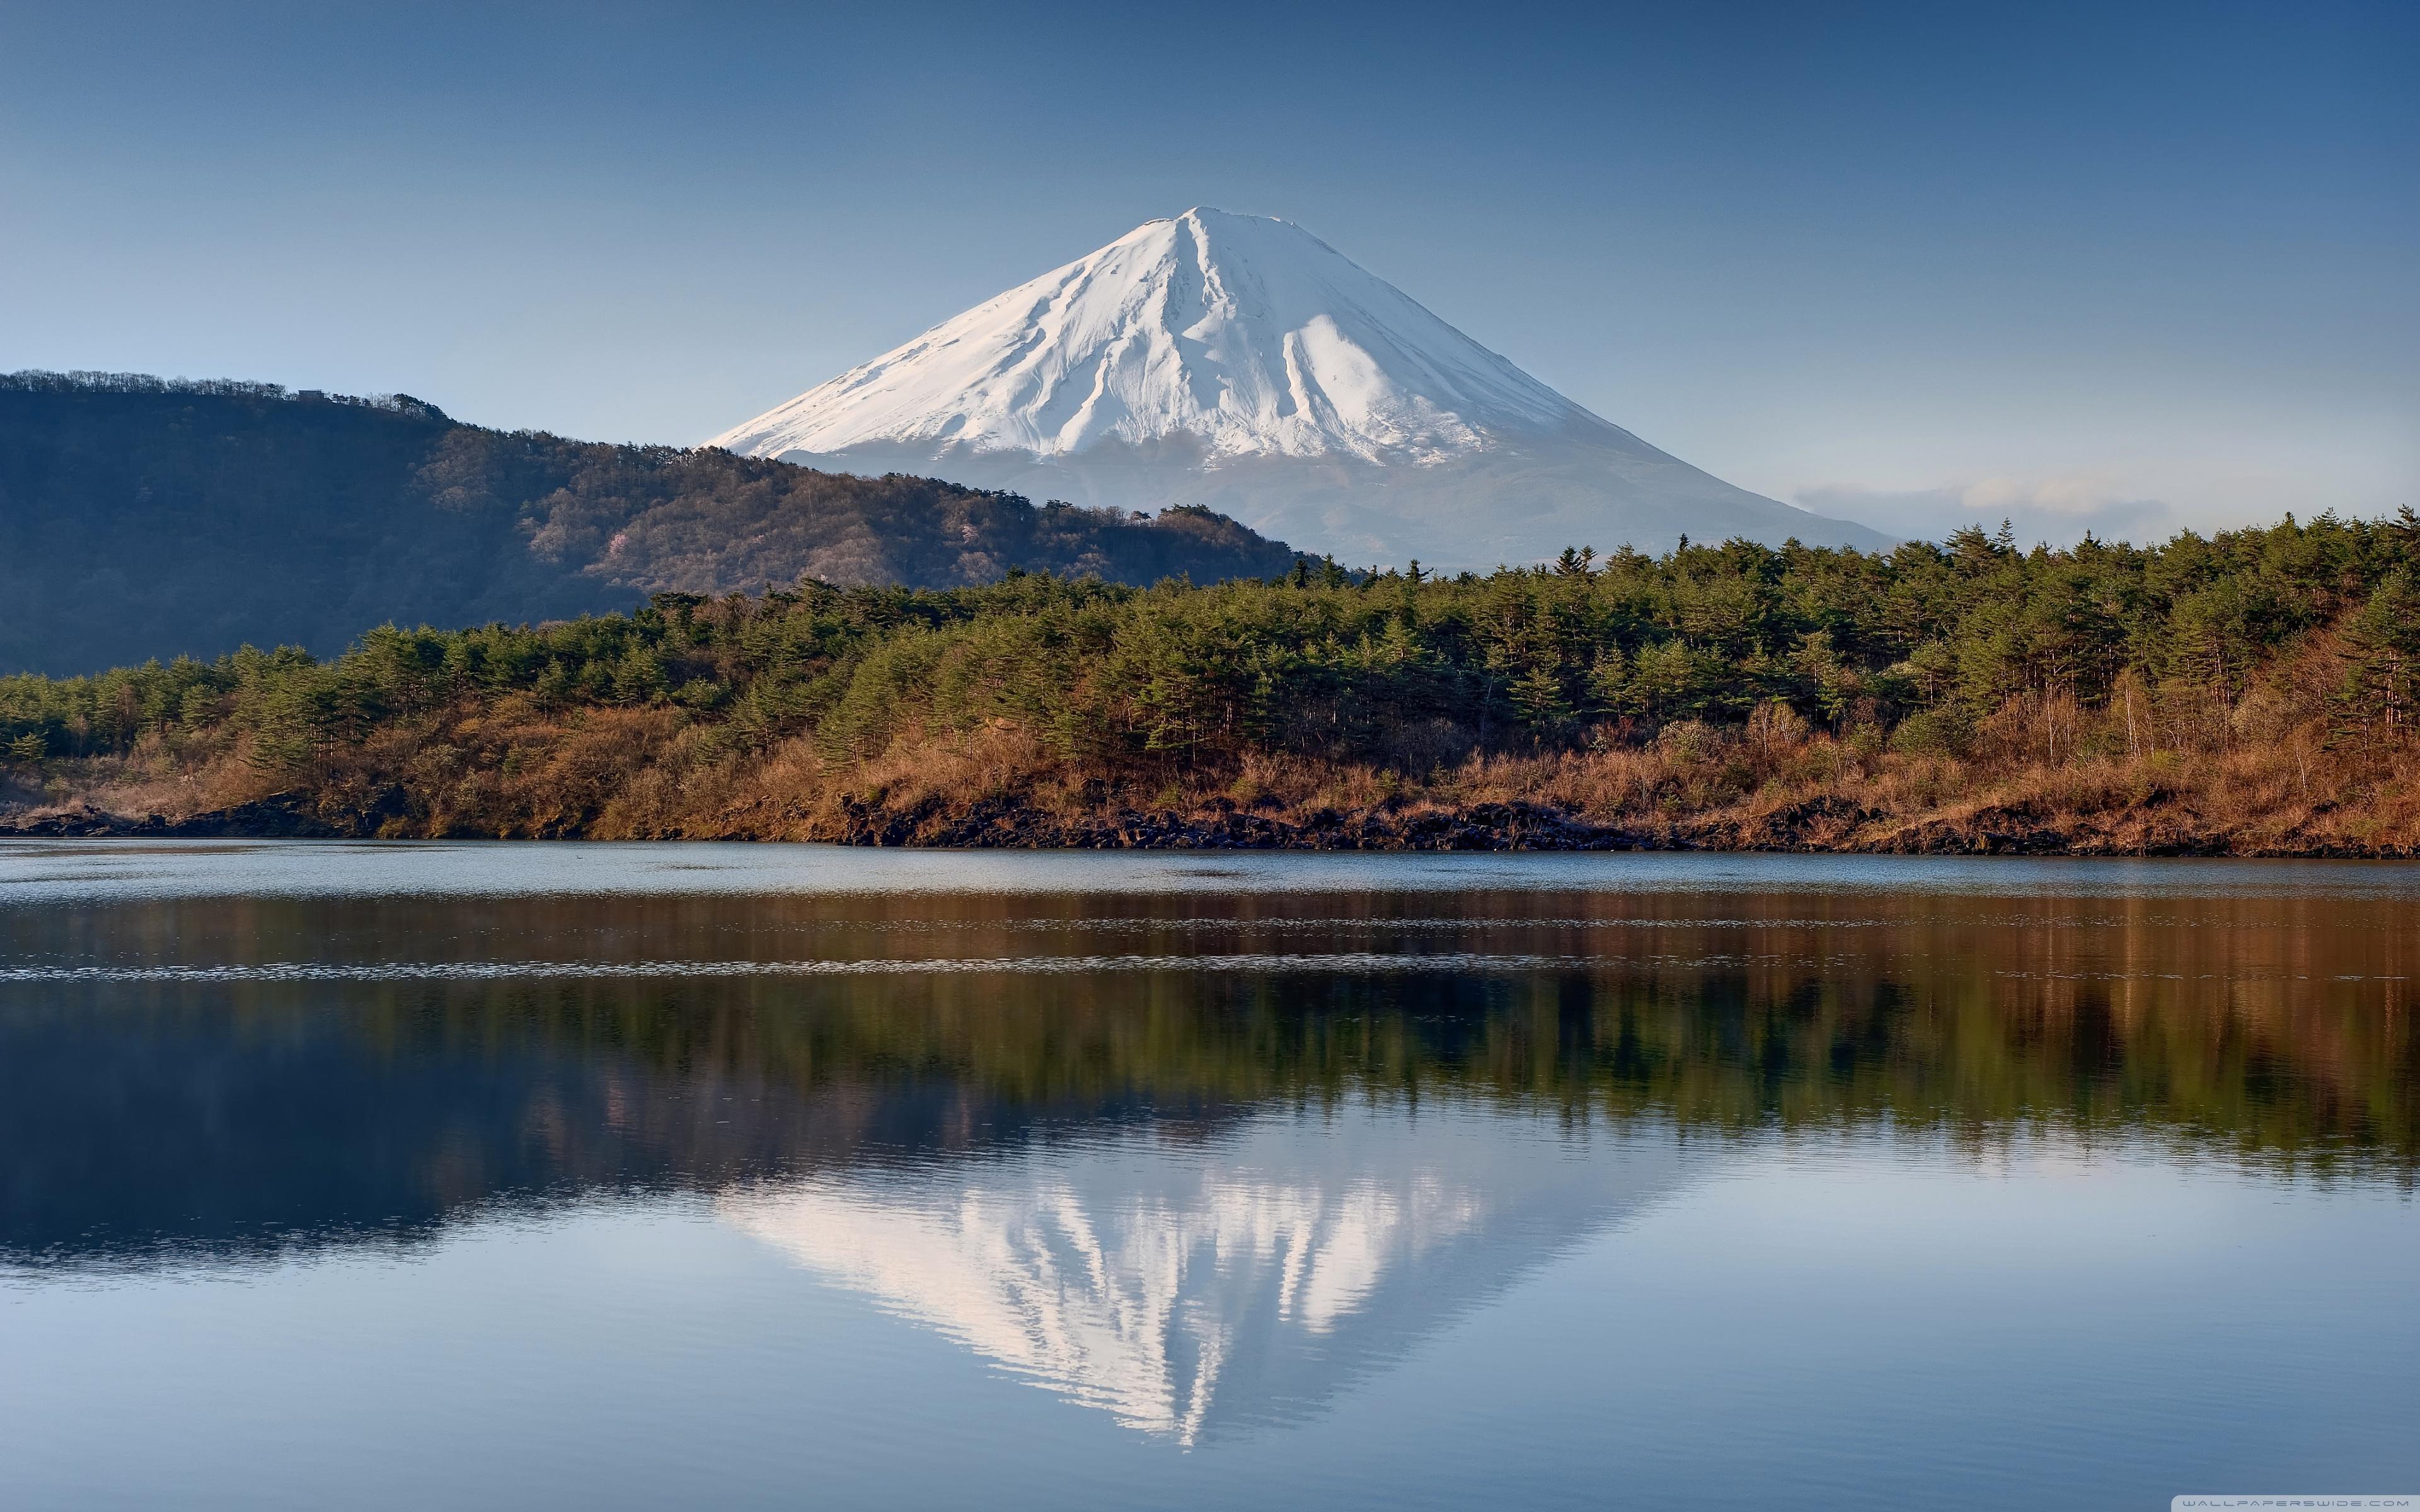 Mount Fuji Reflection Wallpapers Wallpaper Cave